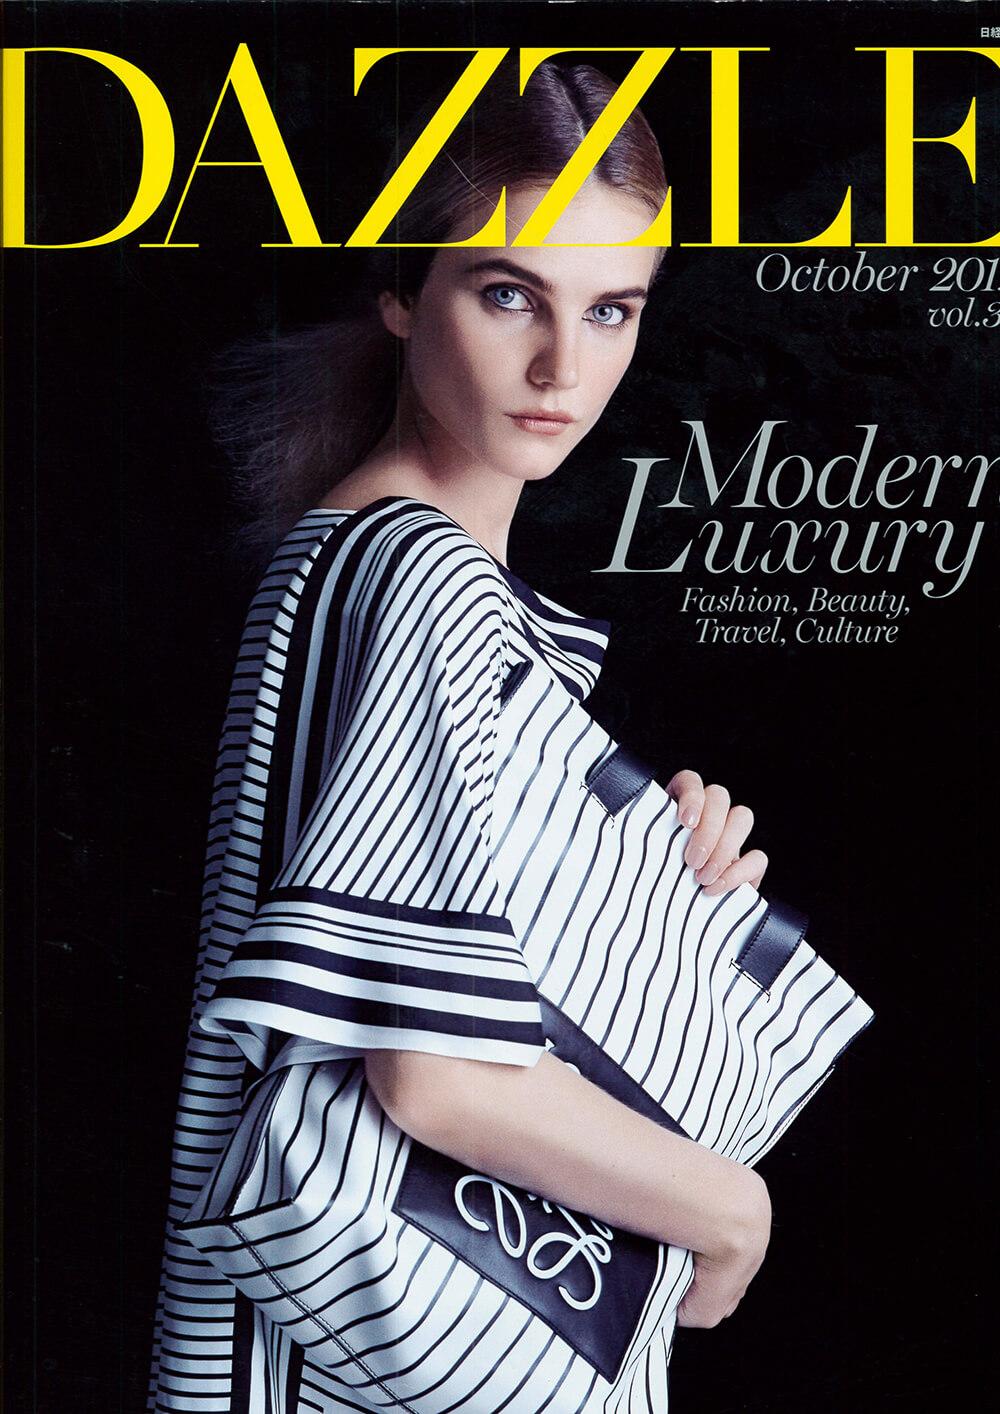 Dazzle Magazine